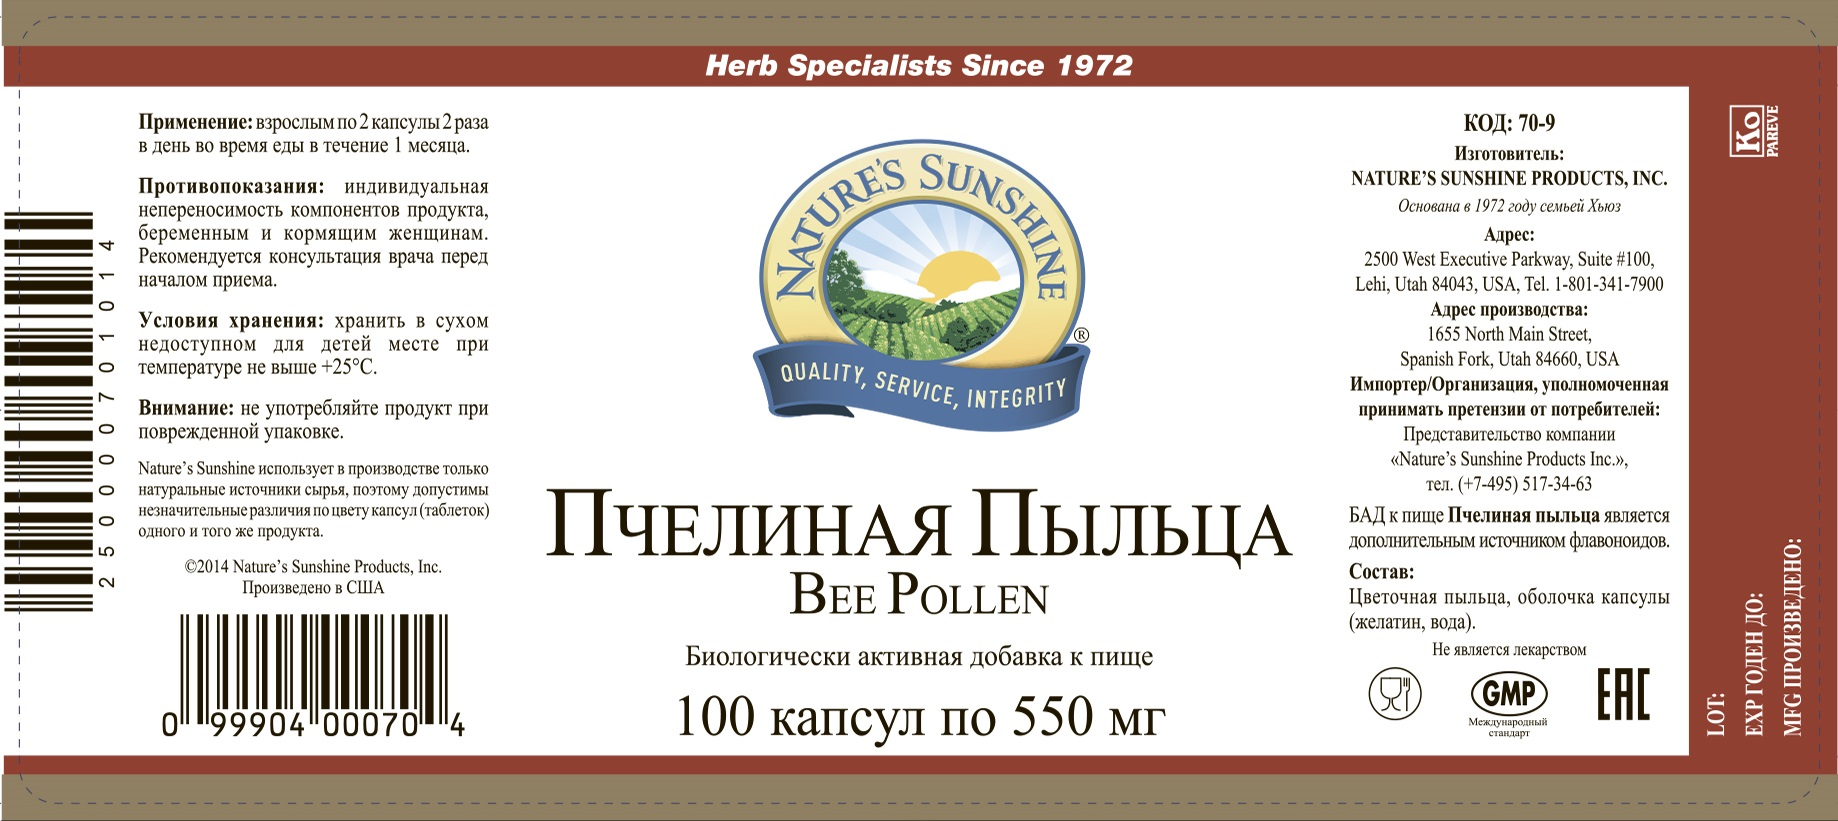 Картинка Пчелиная Пыльца / Bee Pollen от магазина Nature's Sunshine Products